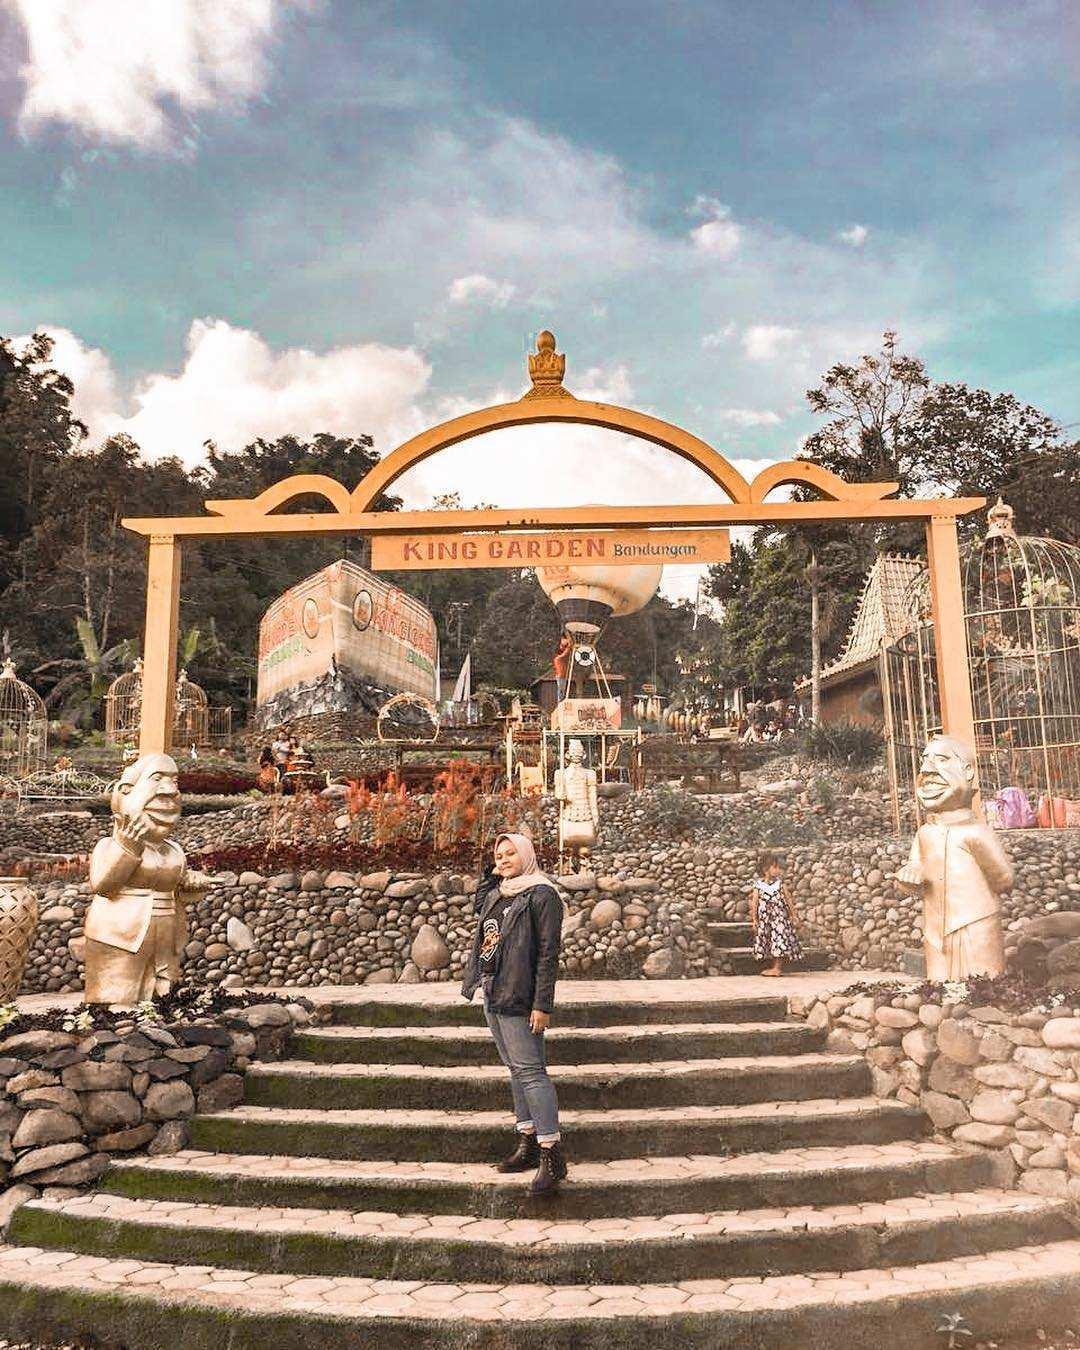 Berfoto di Gapura King Garden Semarang, Image From @intpf